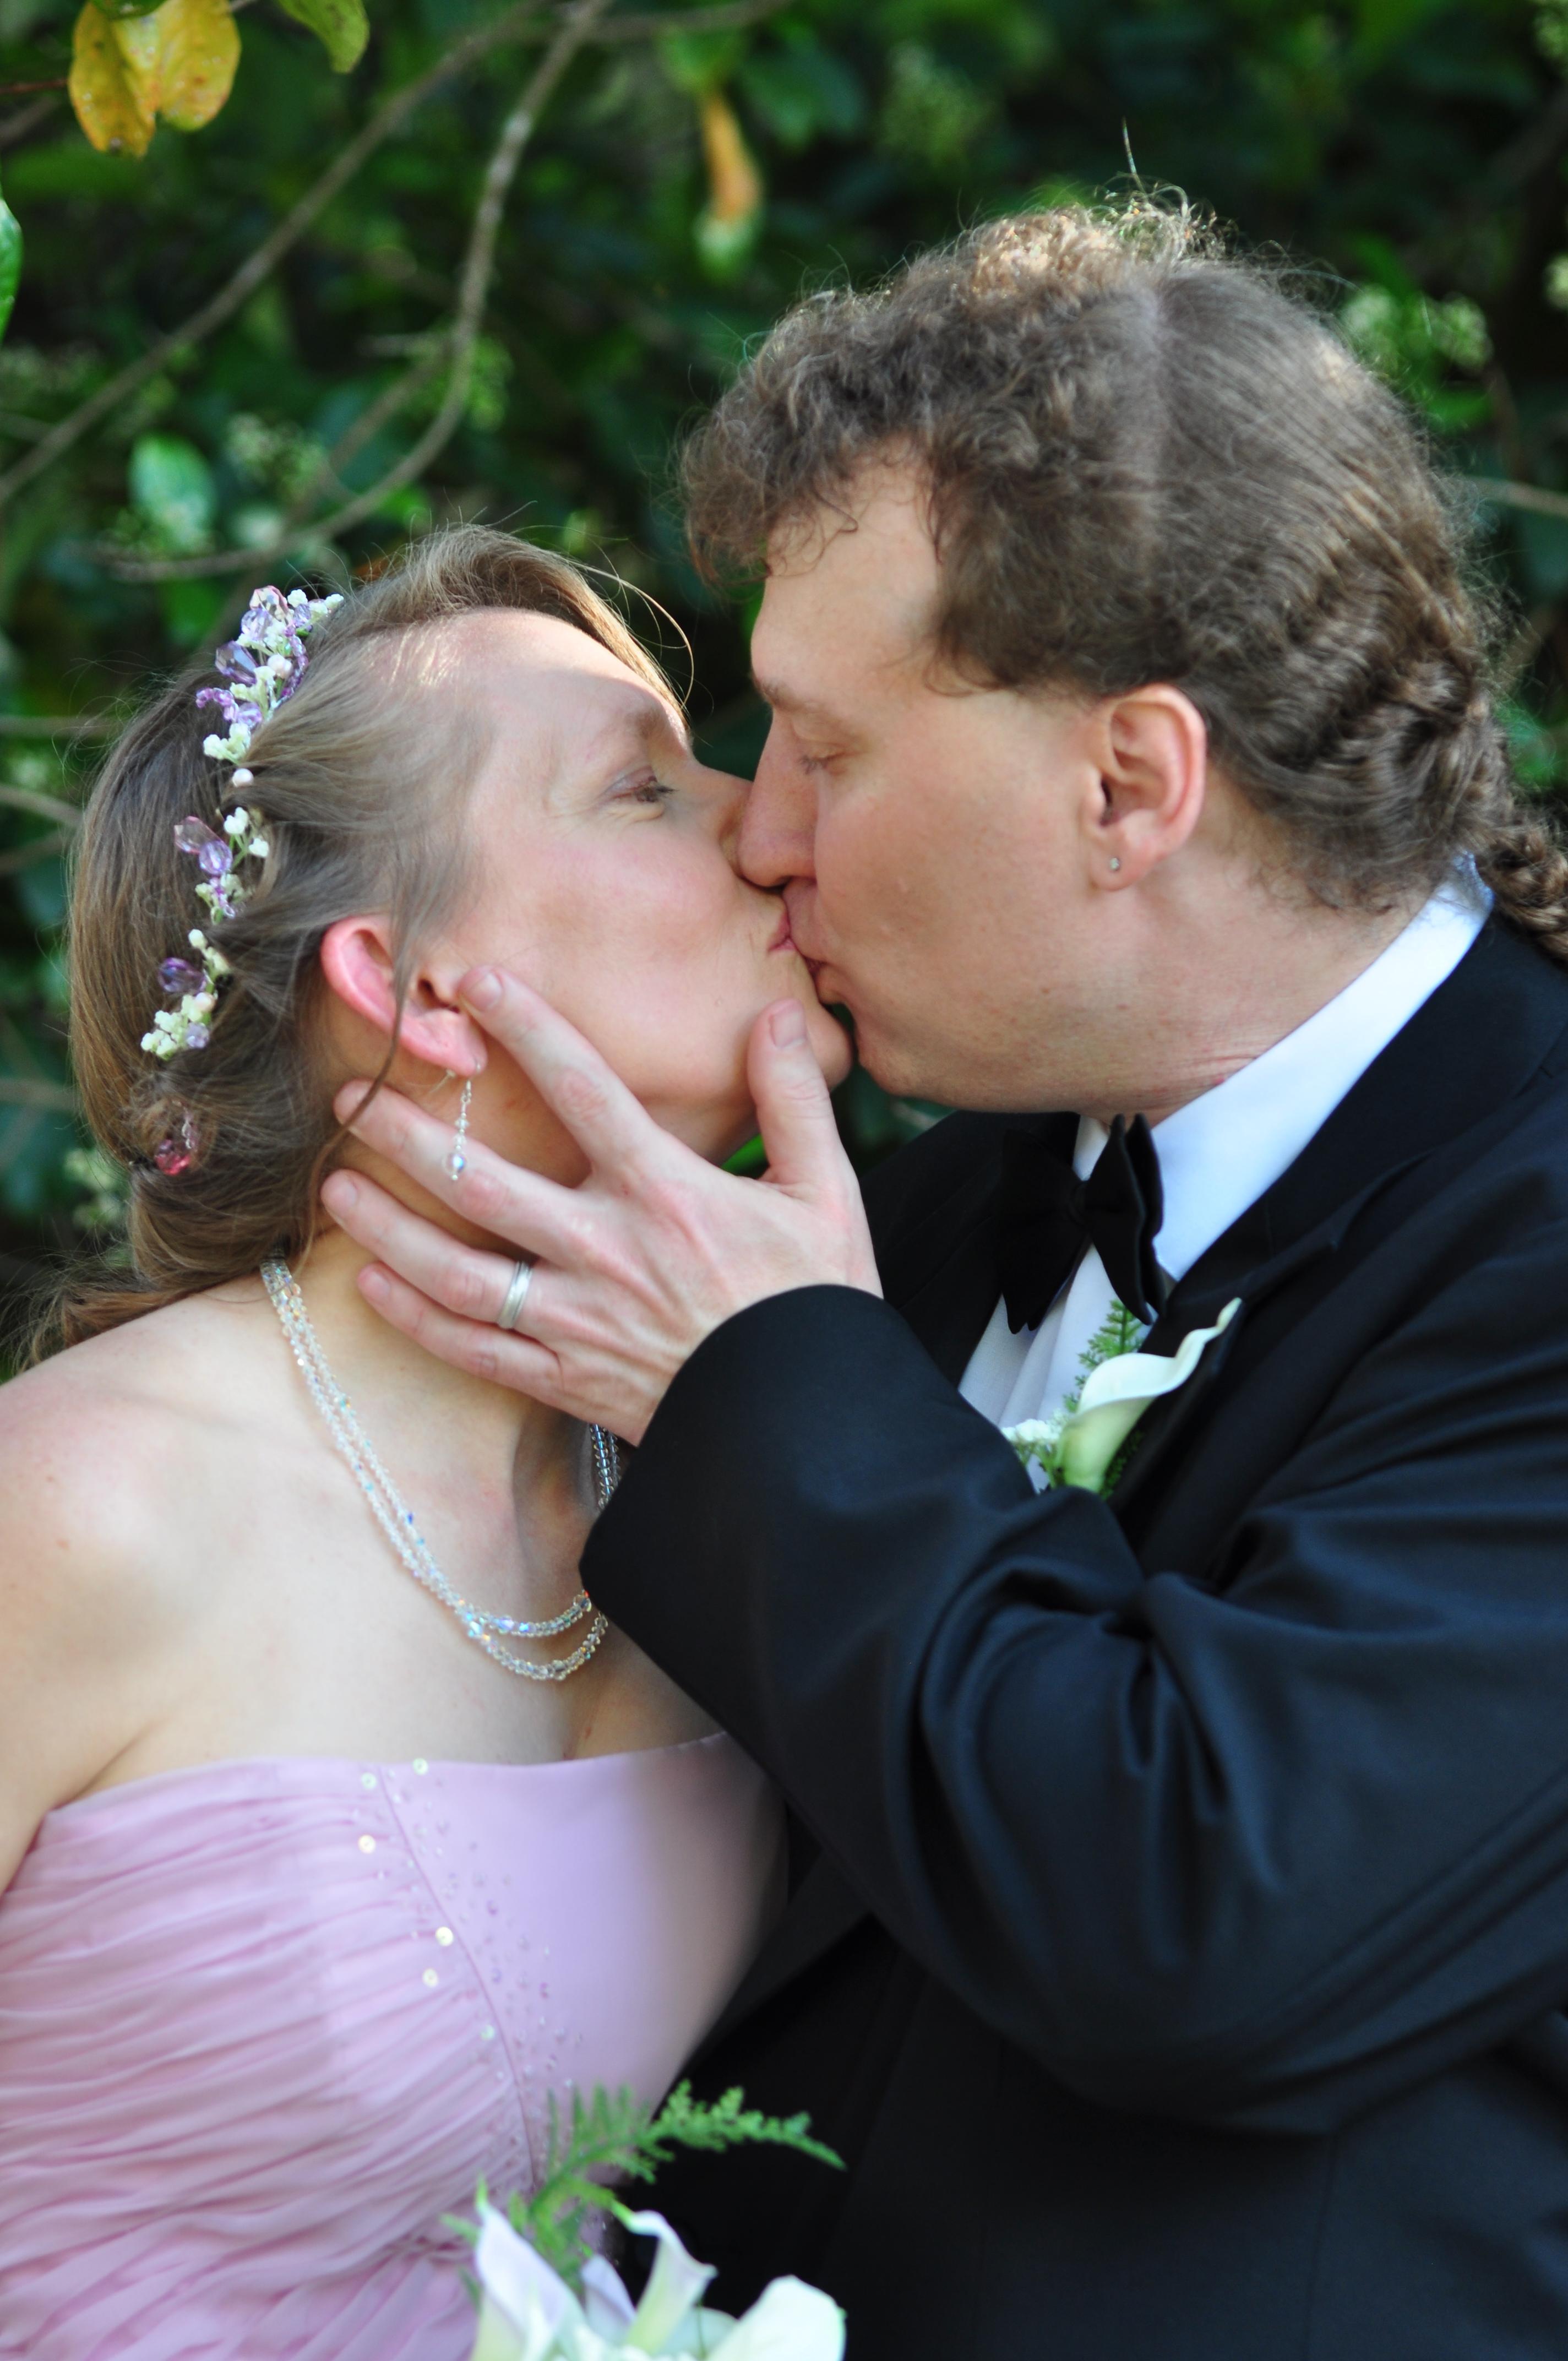 emily-and-travis-4-1-2013-april-fools-wedding-421